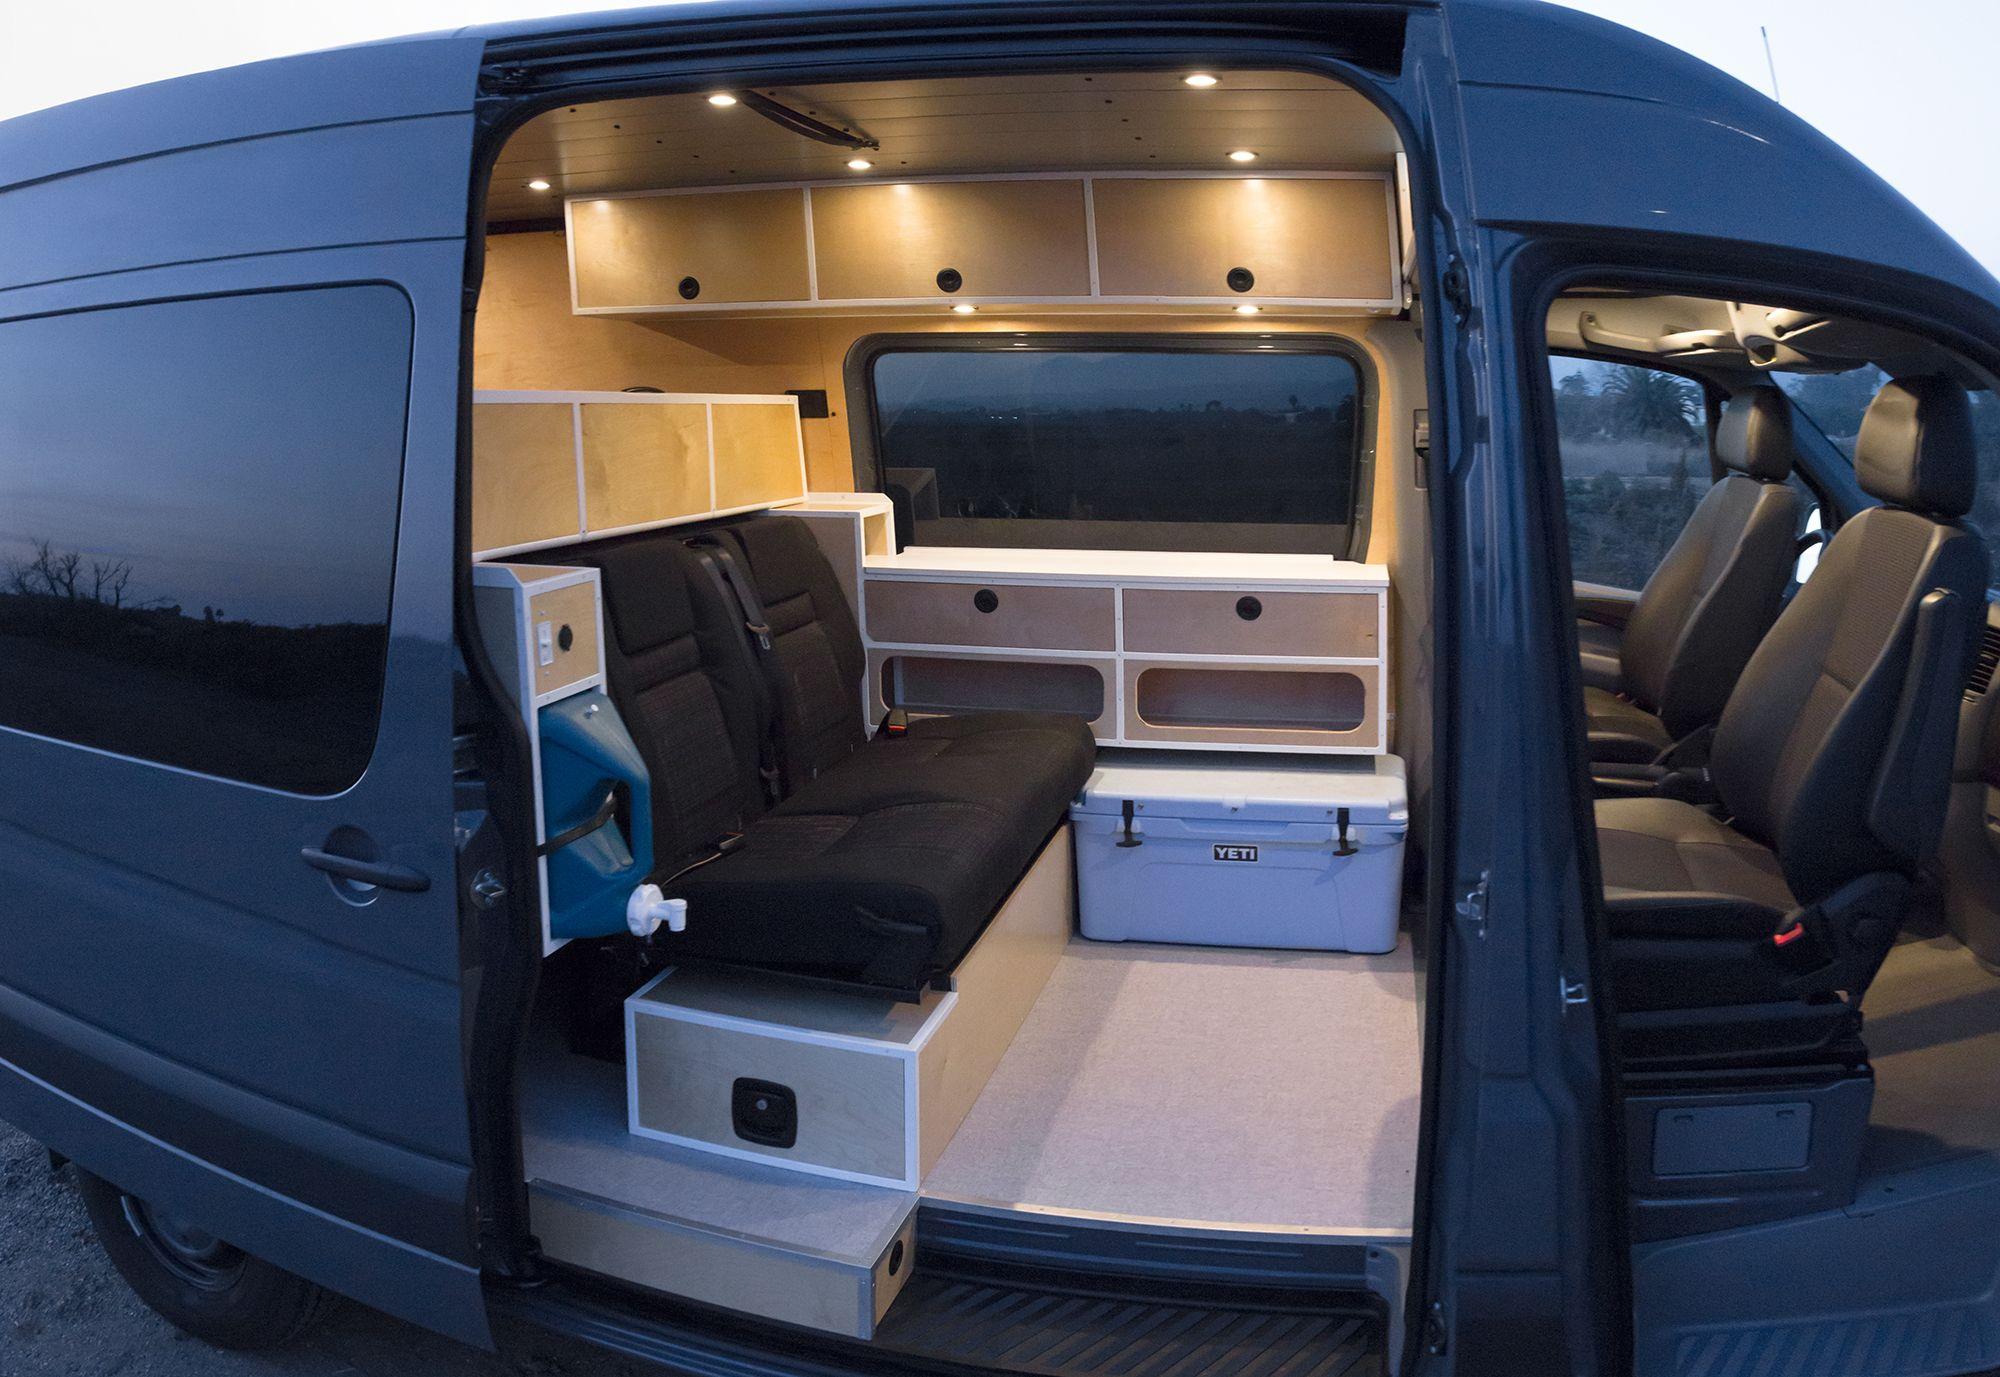 Seitz Sea Er Rig Racks In 2020 Van Interior Campervan Bed Campervan Interior